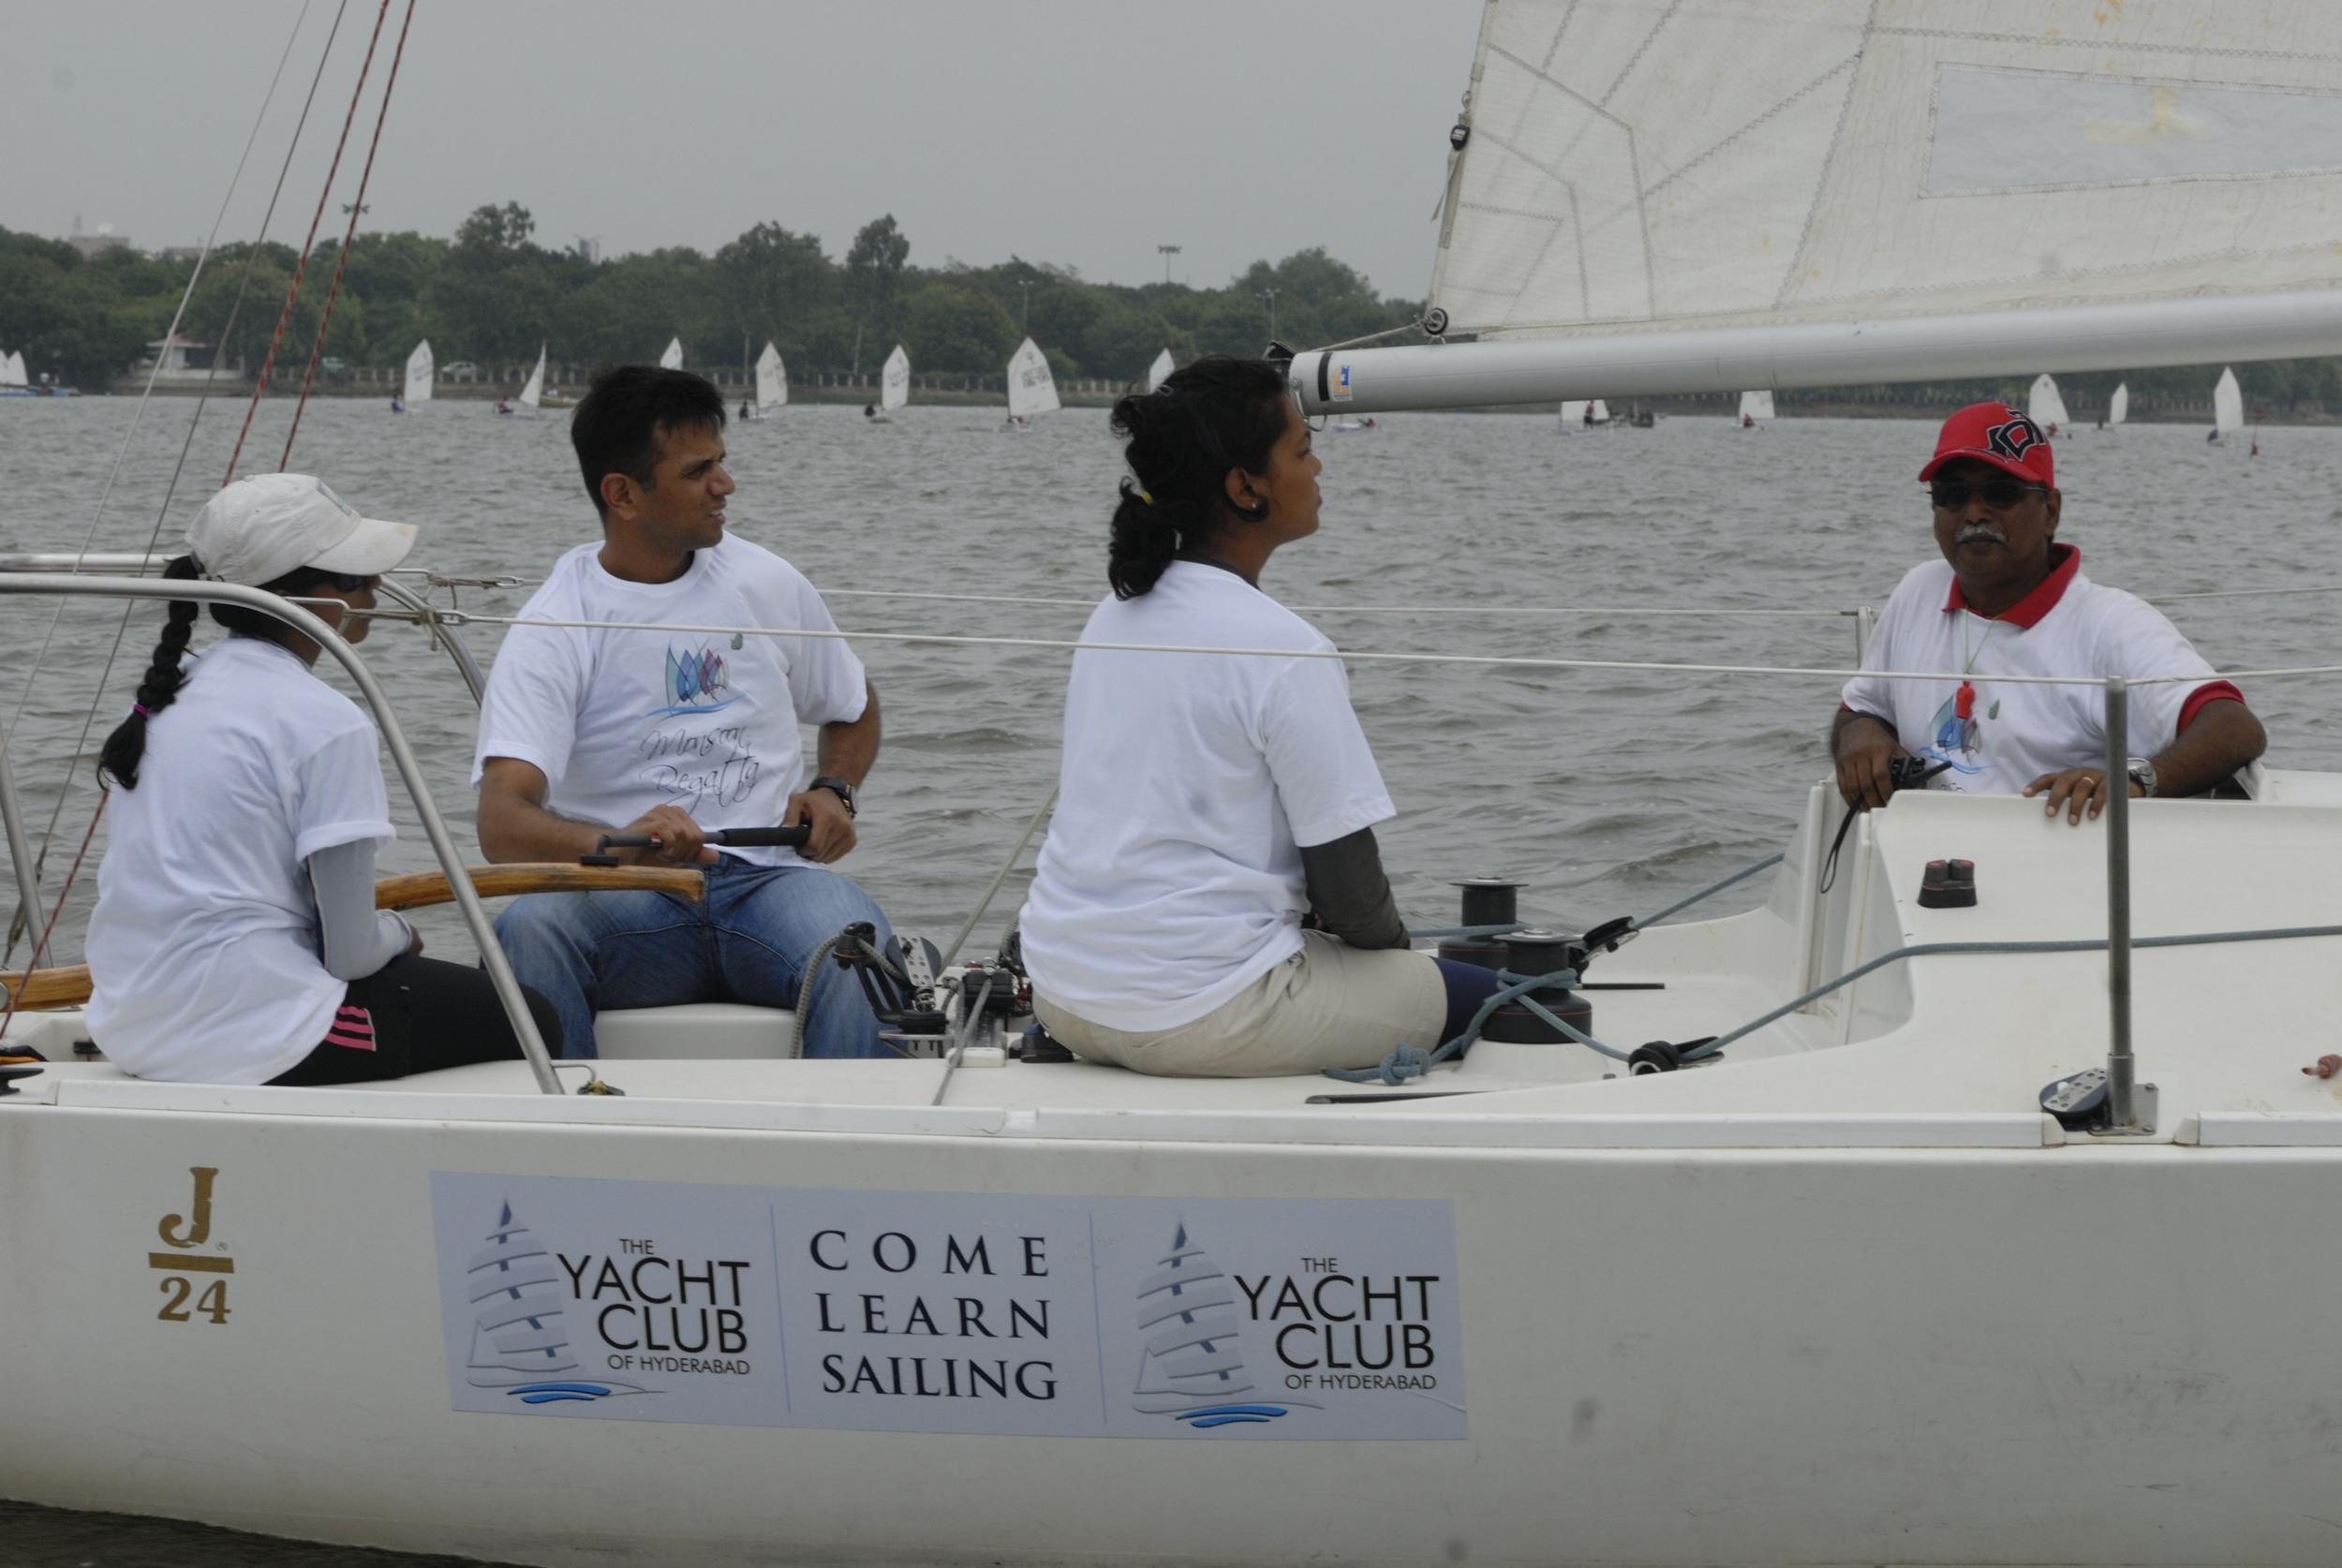 RAHUL DRAVID learning to sail at the Yacht Club